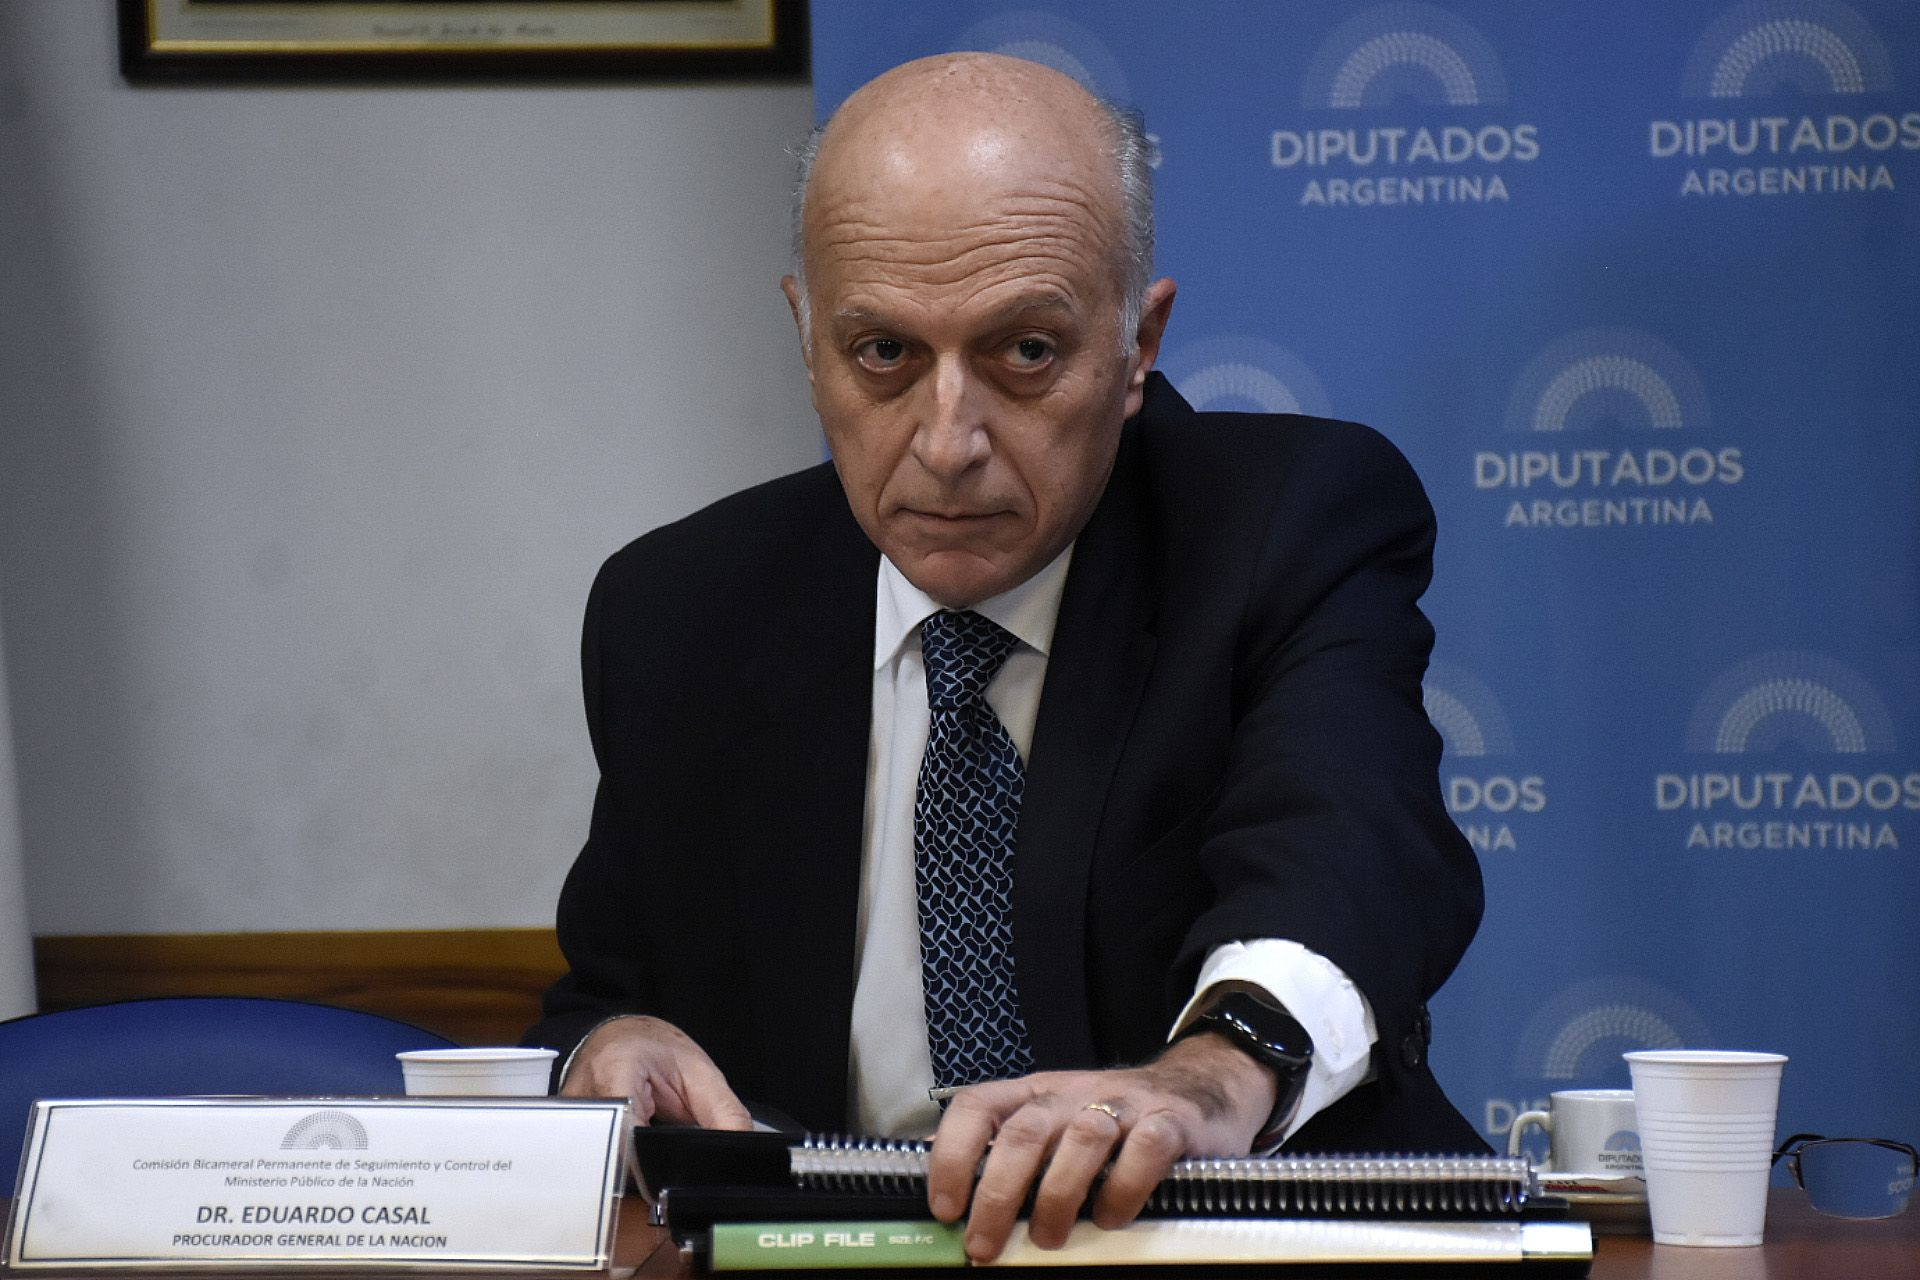 Procurador general interno Eduardo Casal (Nicolás Stulberg)